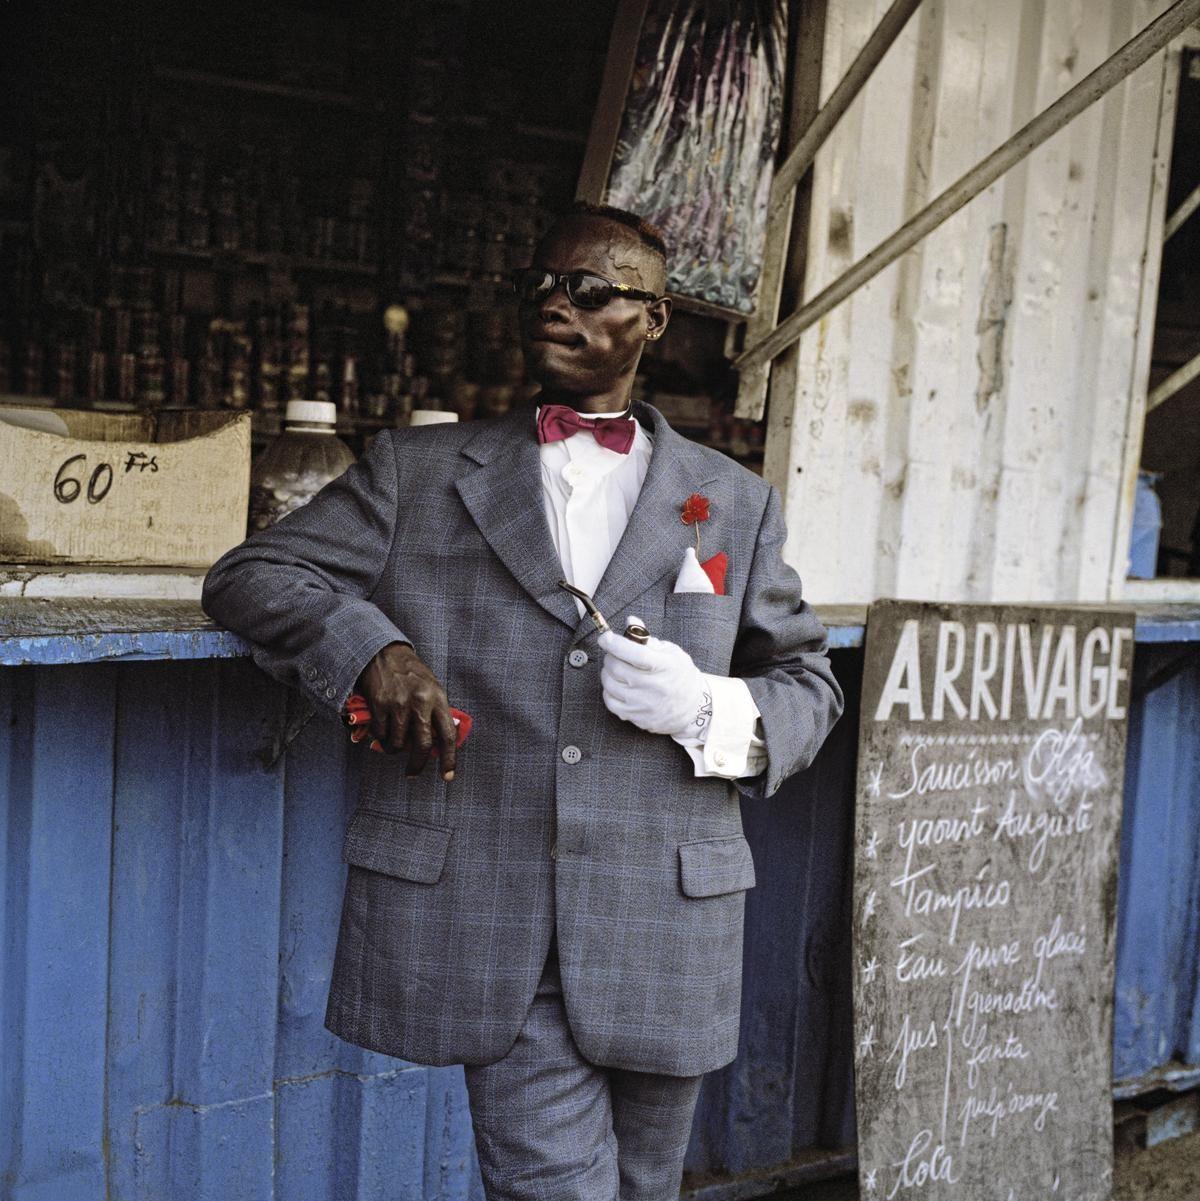 Elegant Man, Suit Jacket, Fashion